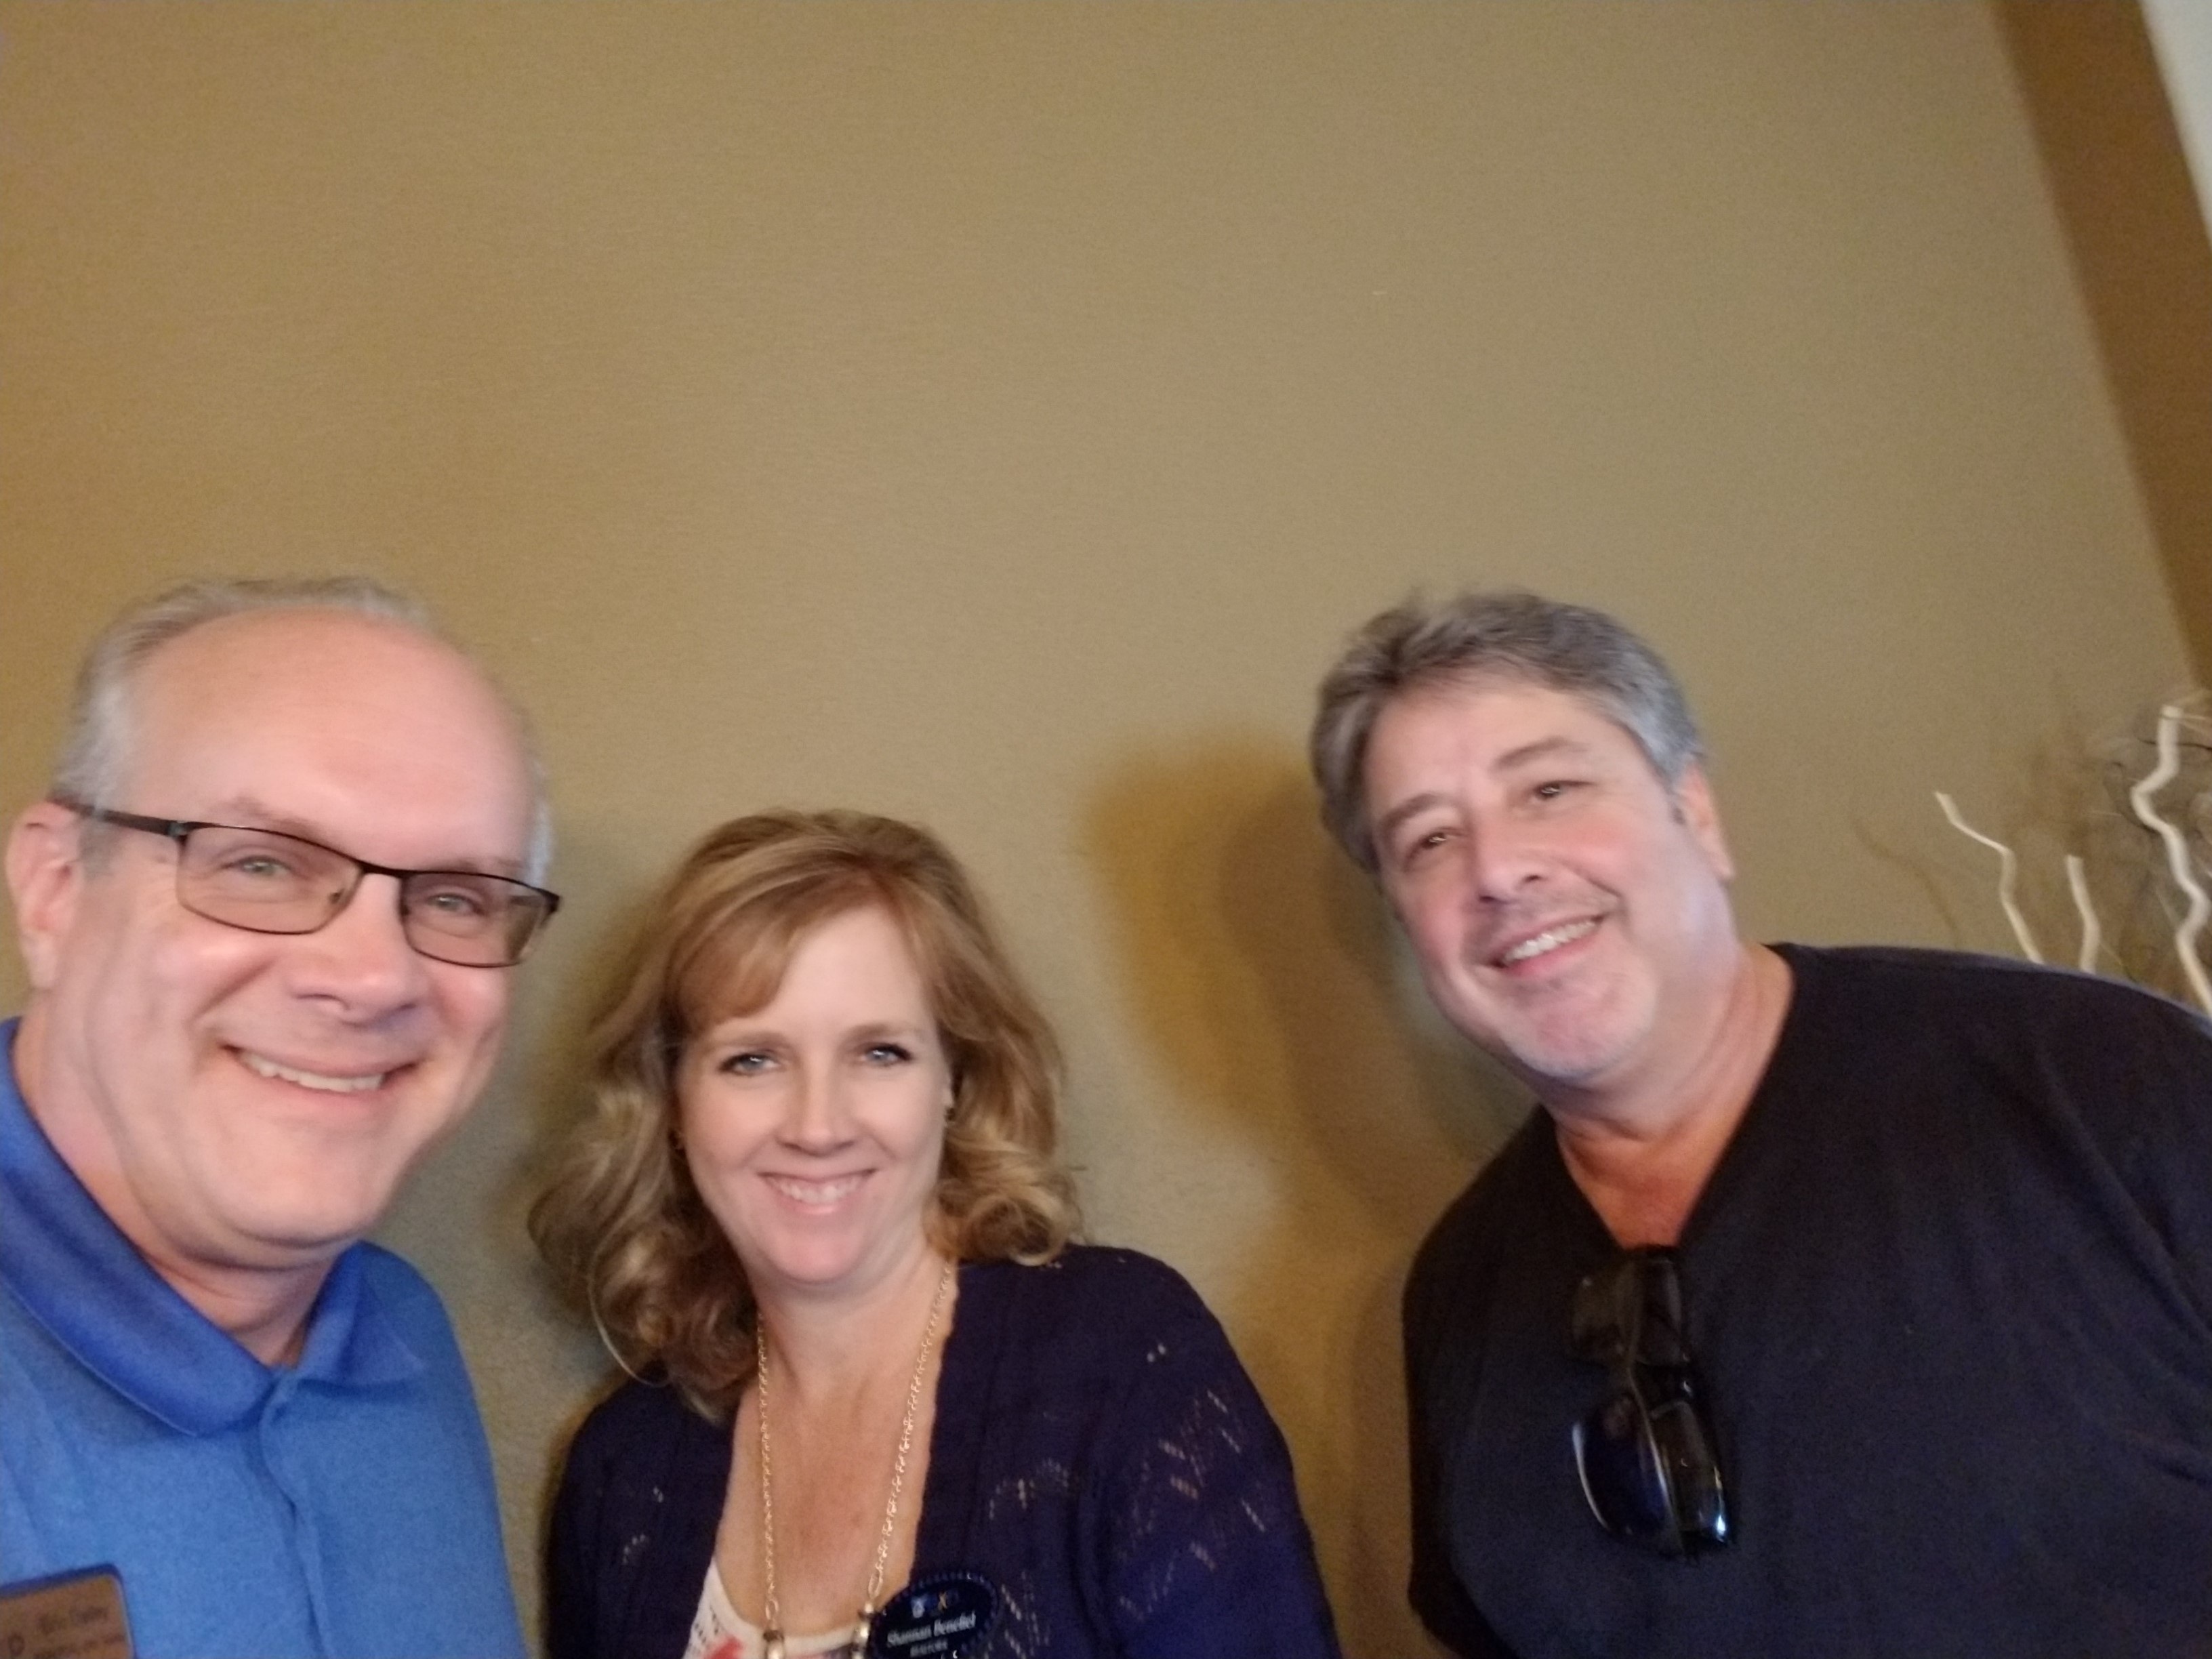 Eric, Shannan, and Jim